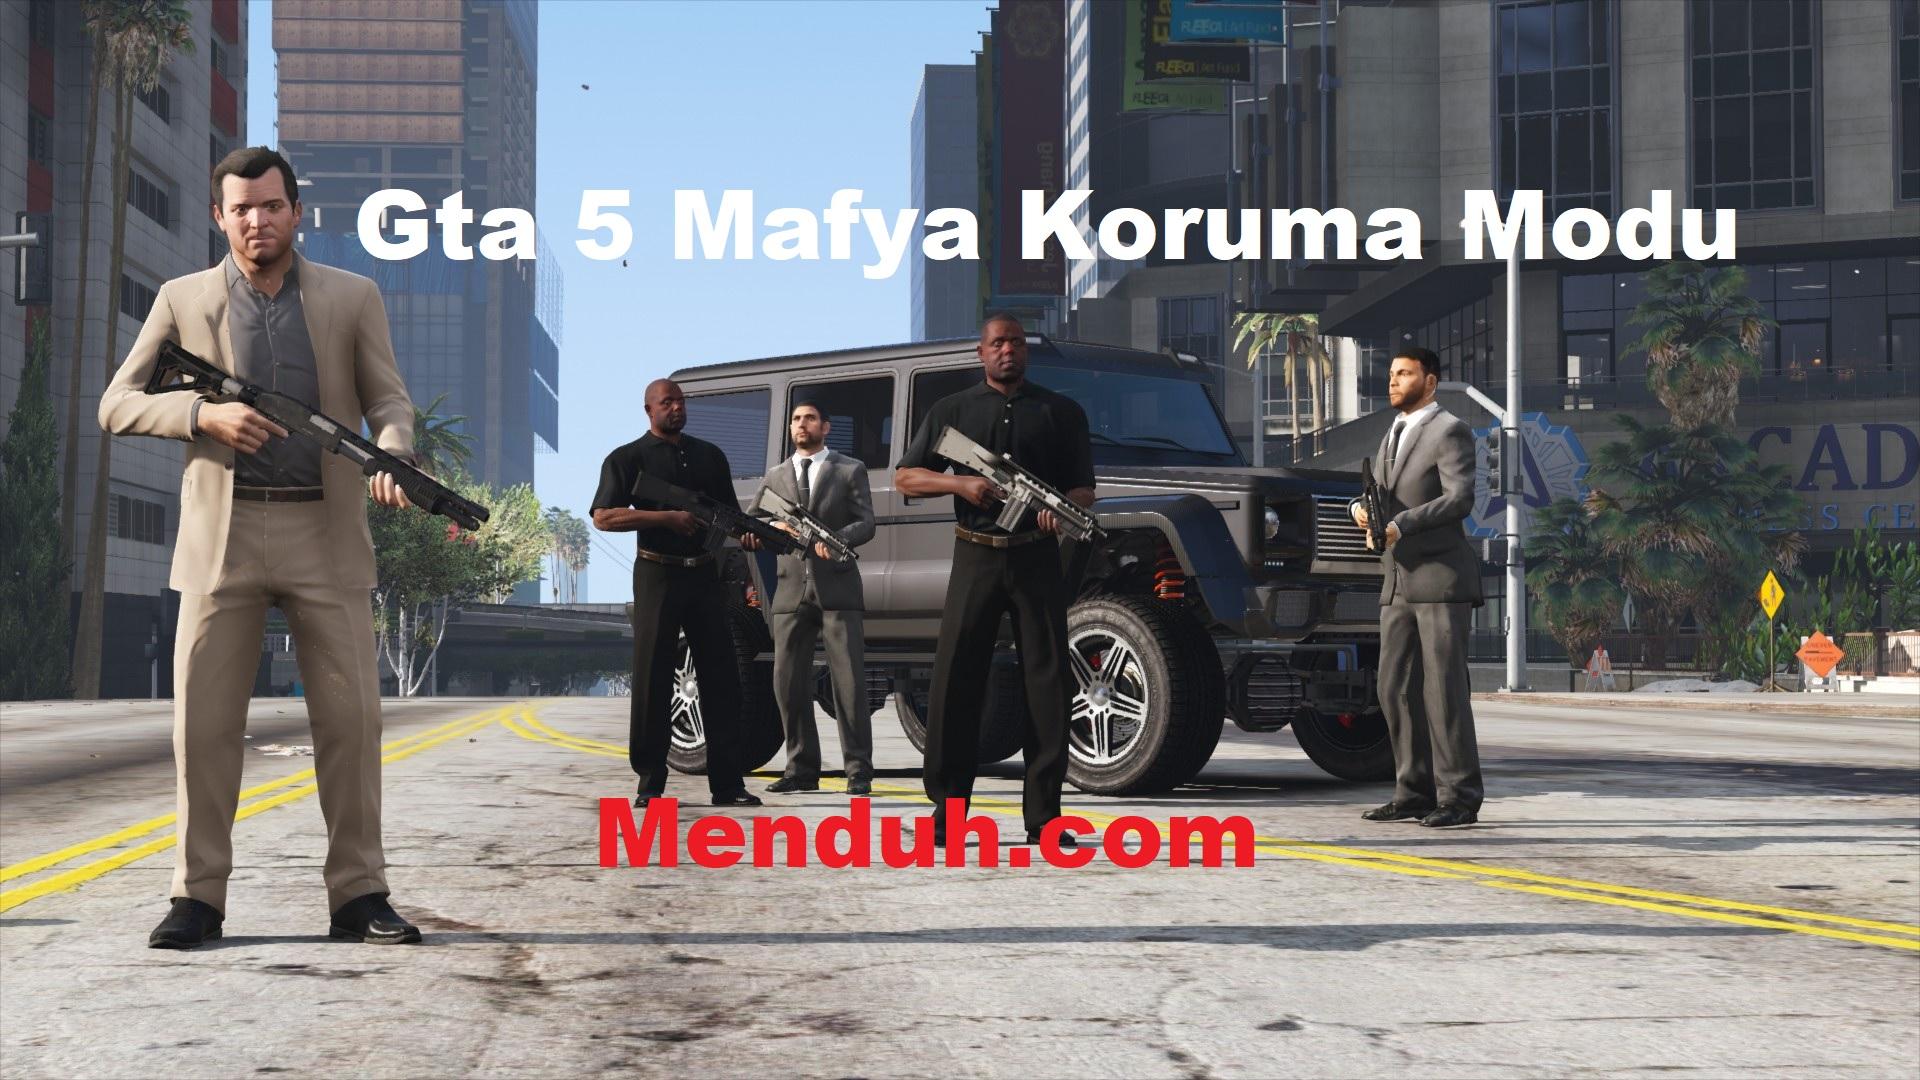 Gta 5 Bodyguard koruma mafya modu